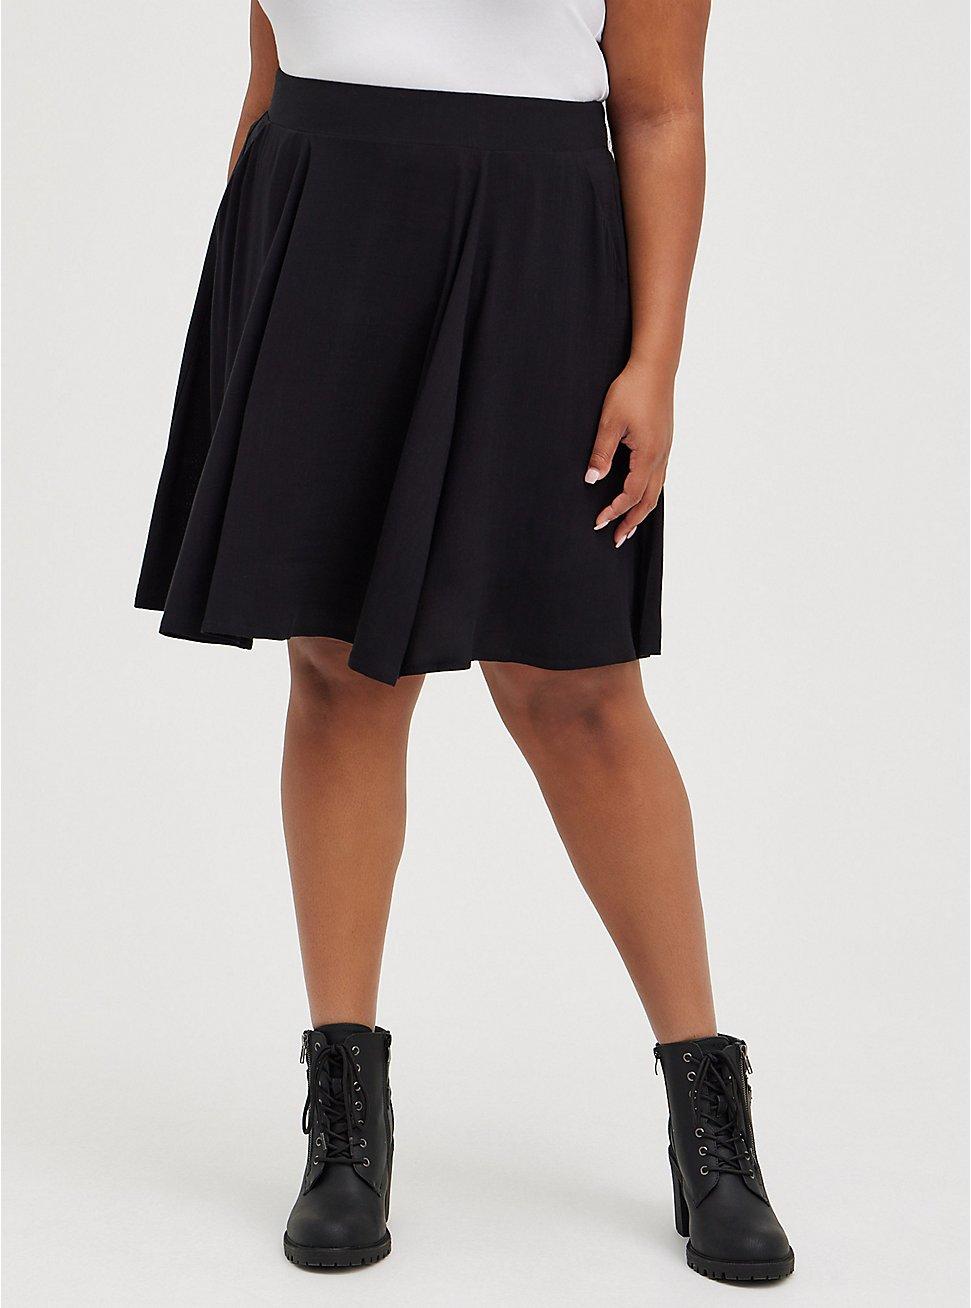 Black Rayon Mini Skater Skirt, DEEP BLACK, hi-res